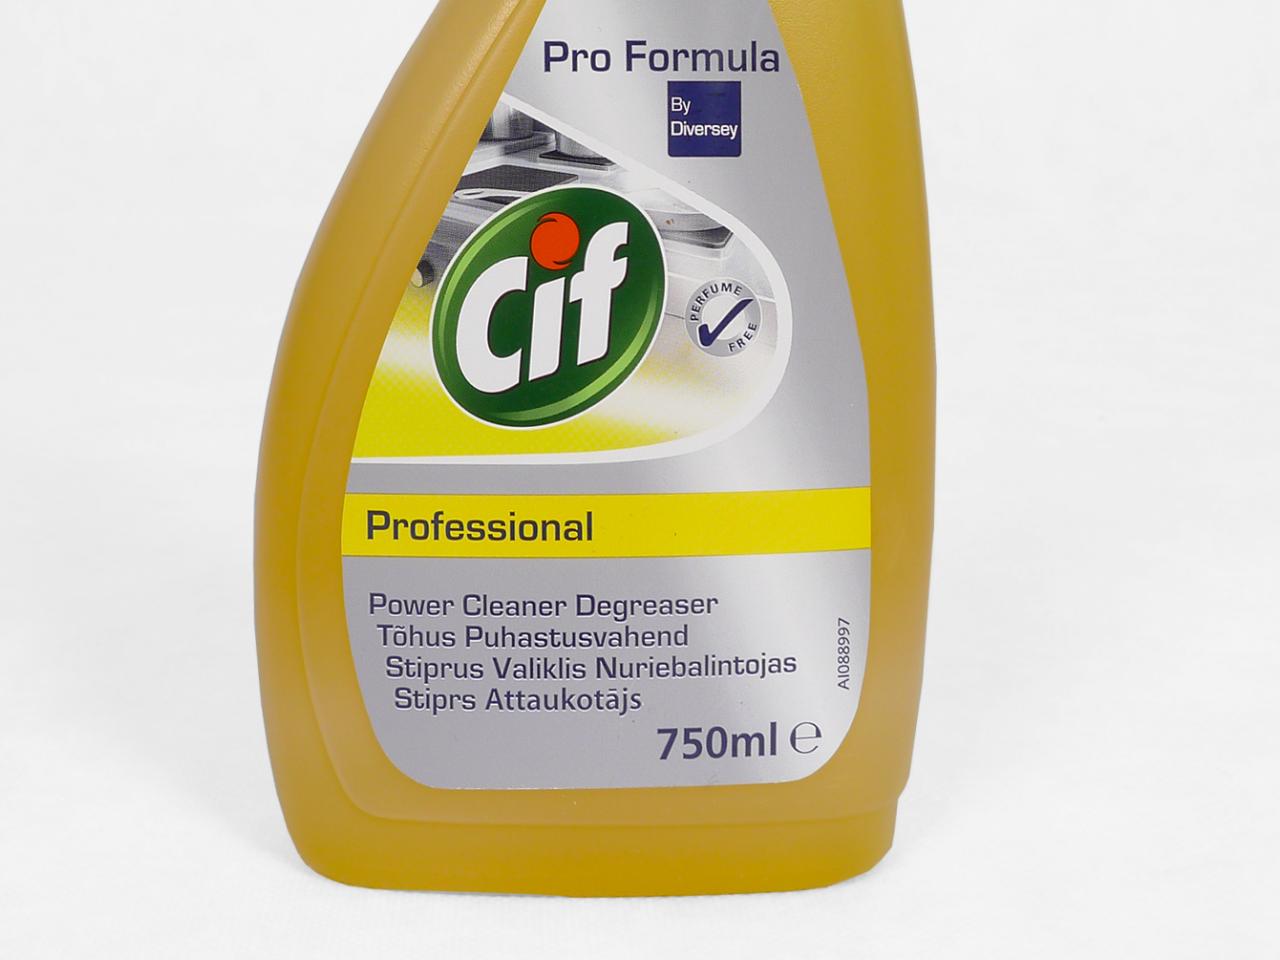 CIF POWER CLEANER DEGREASER MAGAZYN CZYSTOŚCI.COM